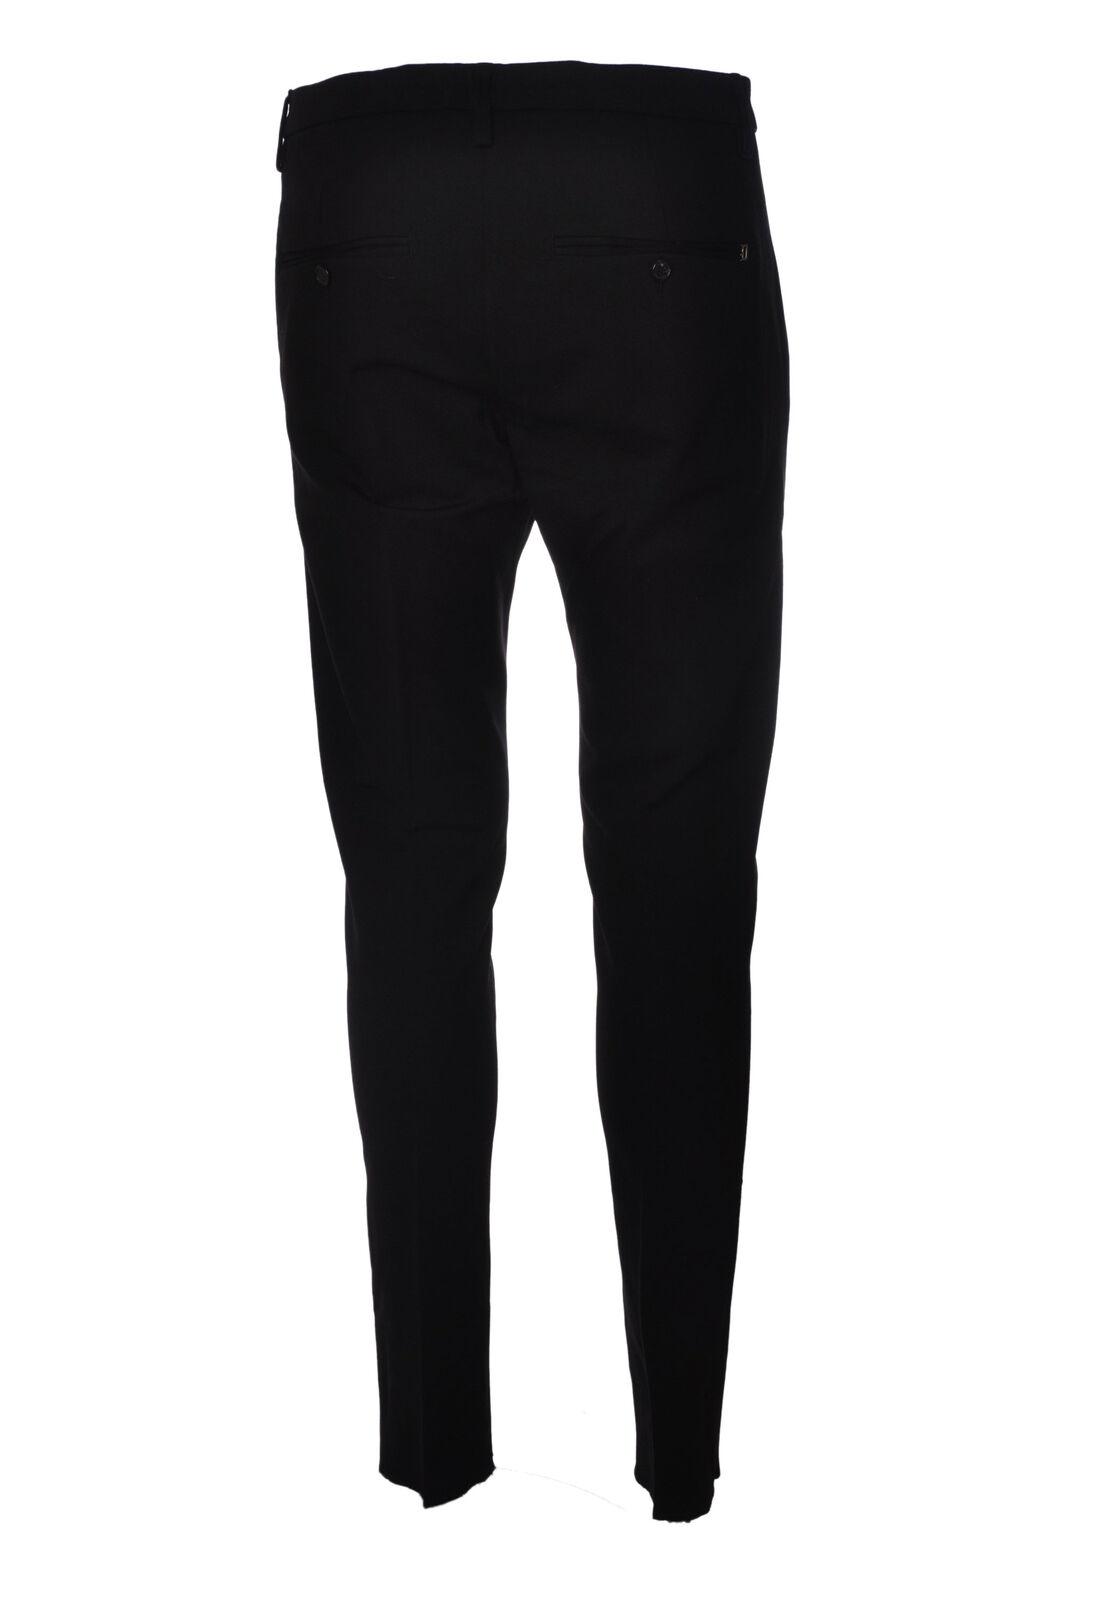 Dondup - Jeans-Pantaloni slim fit - Uomo - Nero Nero Nero - 4027413A193723 eb0910